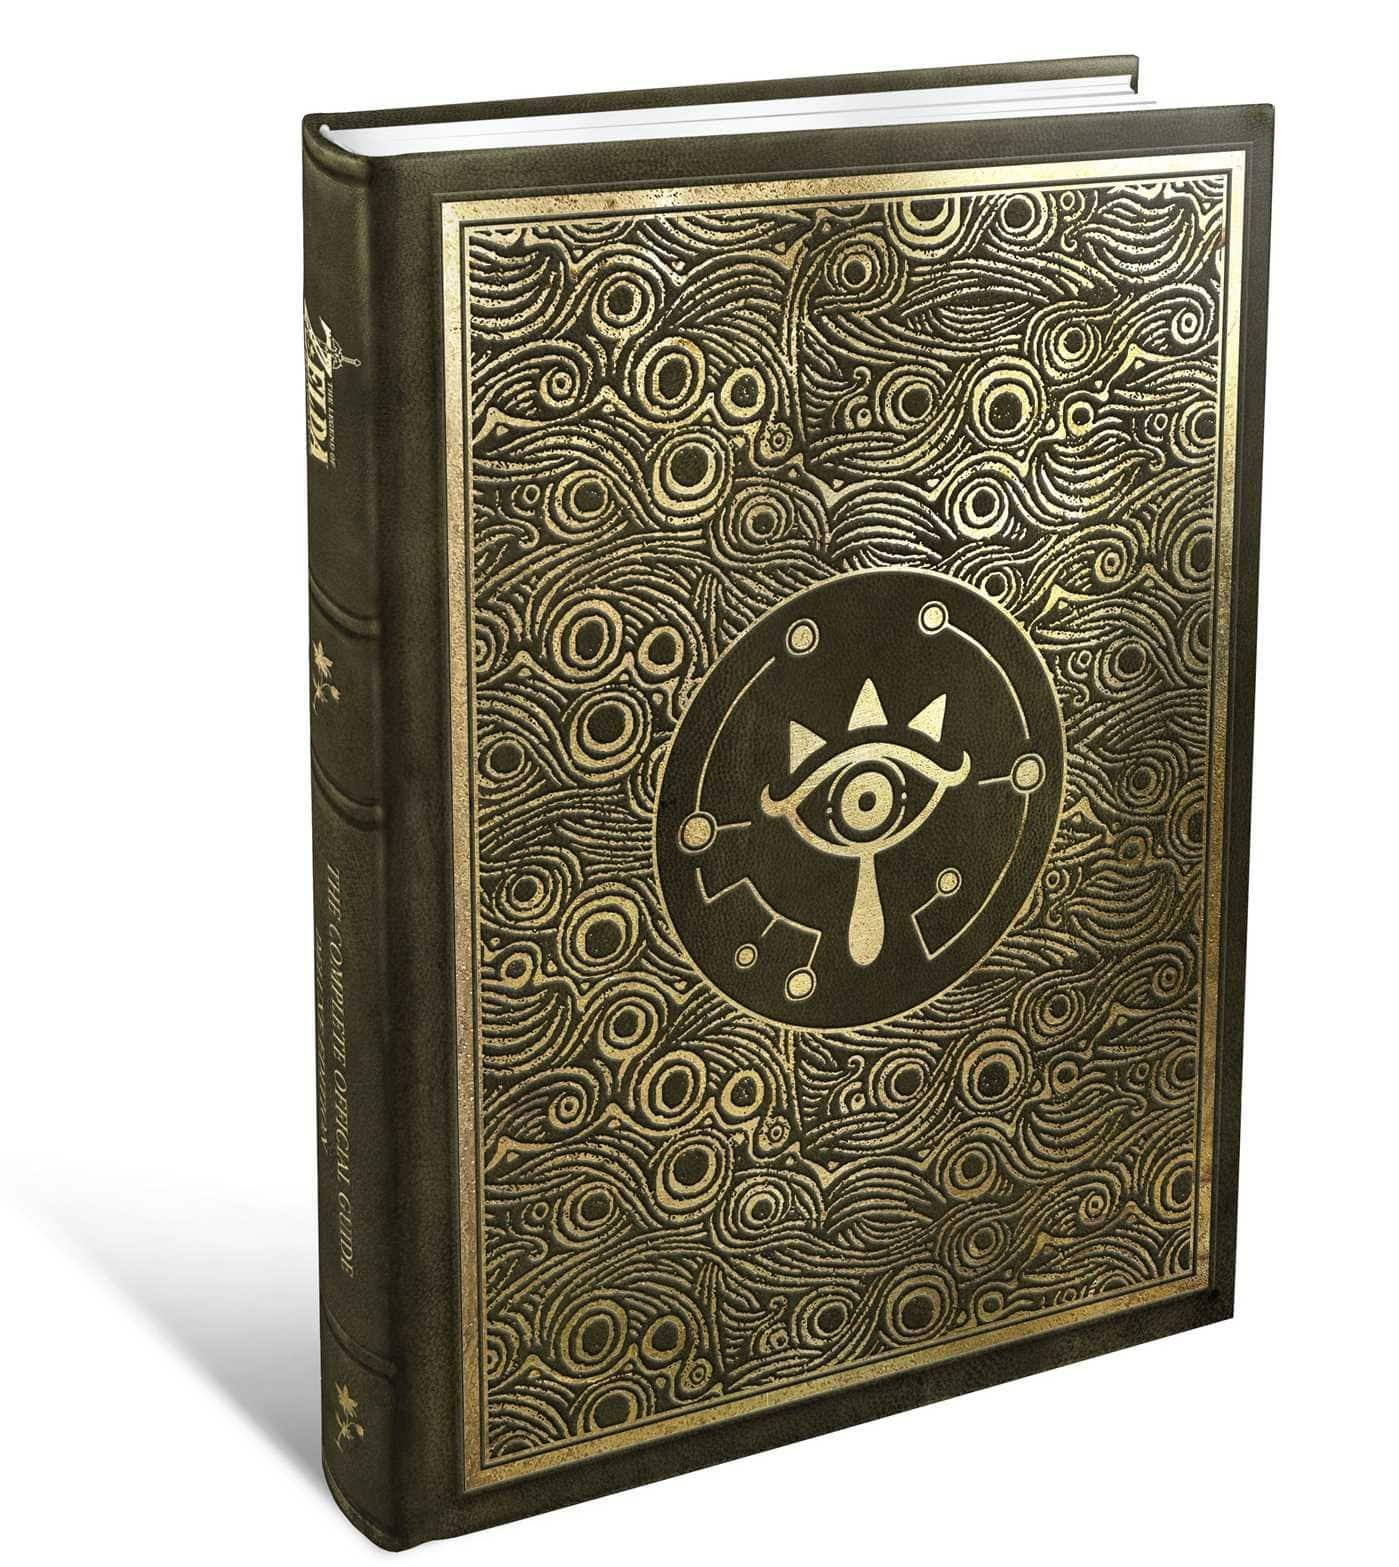 Zelda Breath of the Wild Deluxe Edition Guide $48.48 Amazon